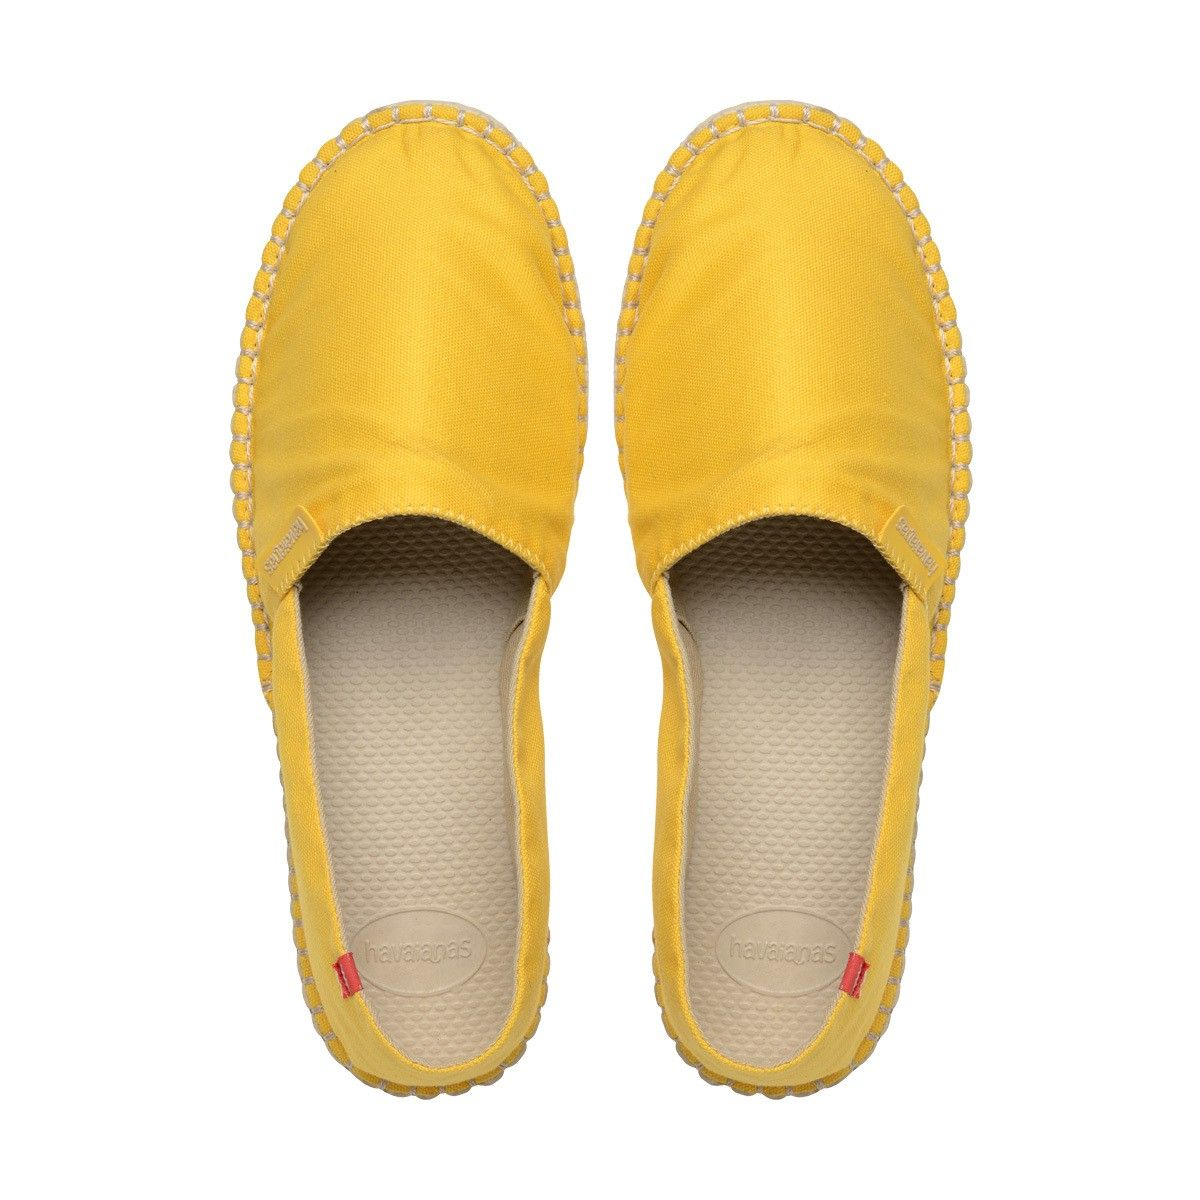 2b7b81234 HAVAIANAS ORIGINE II ESPADRILLE YELLOW YOLK - MEN.  havaianas  shoes  all